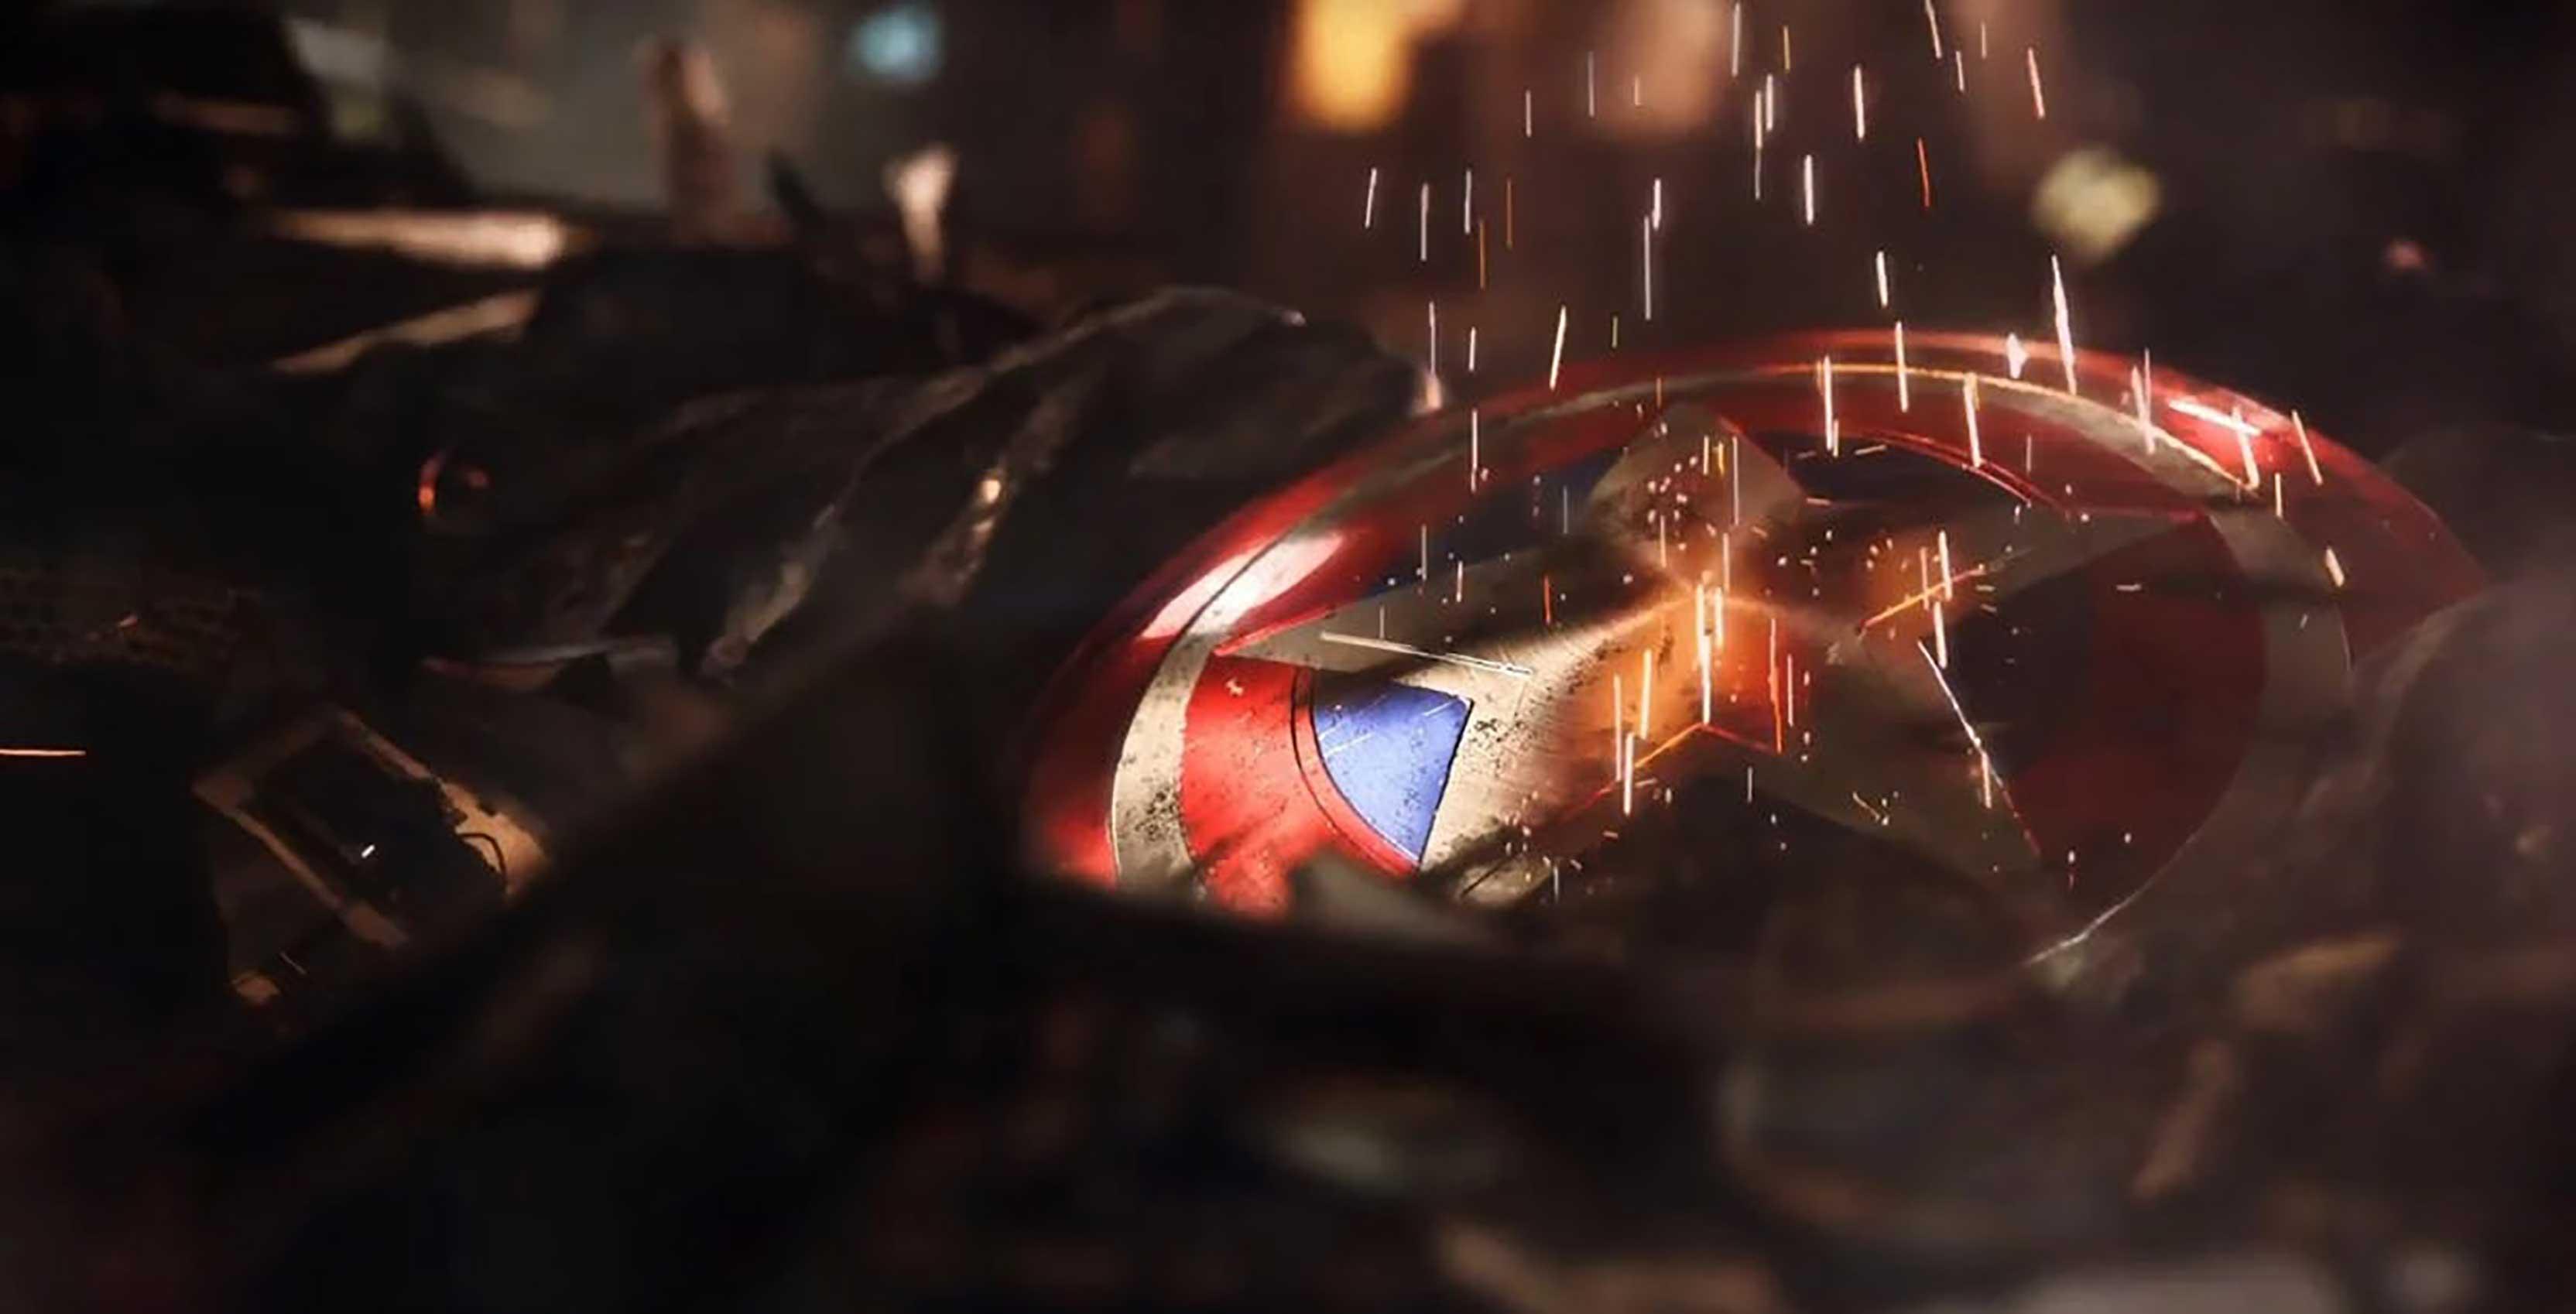 Avengers Project Captain America shield